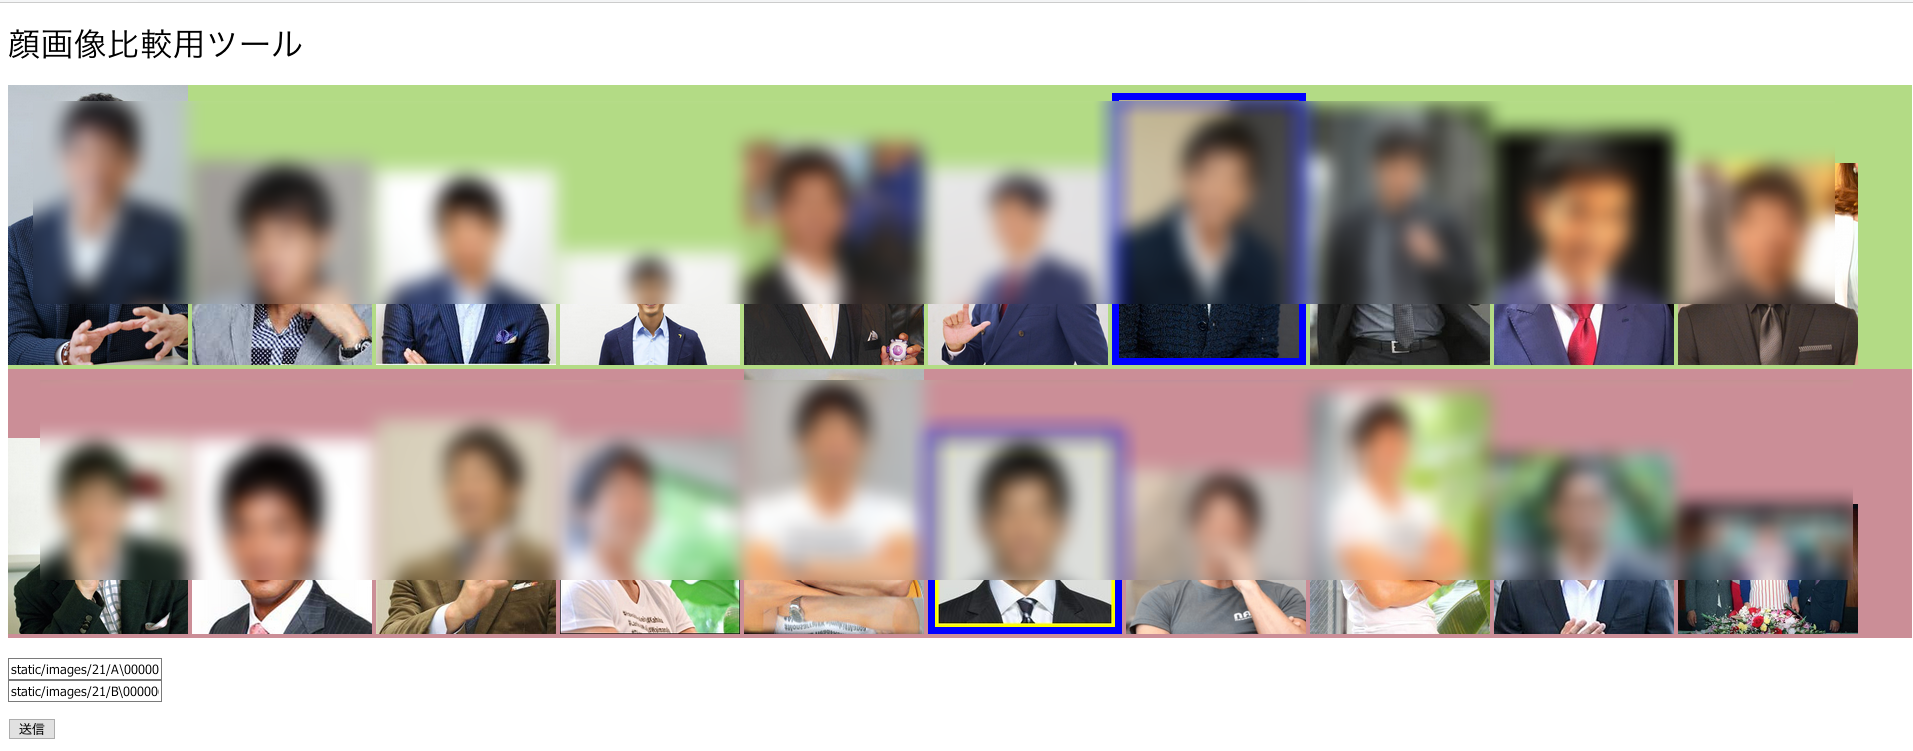 imageClassifyTool.png